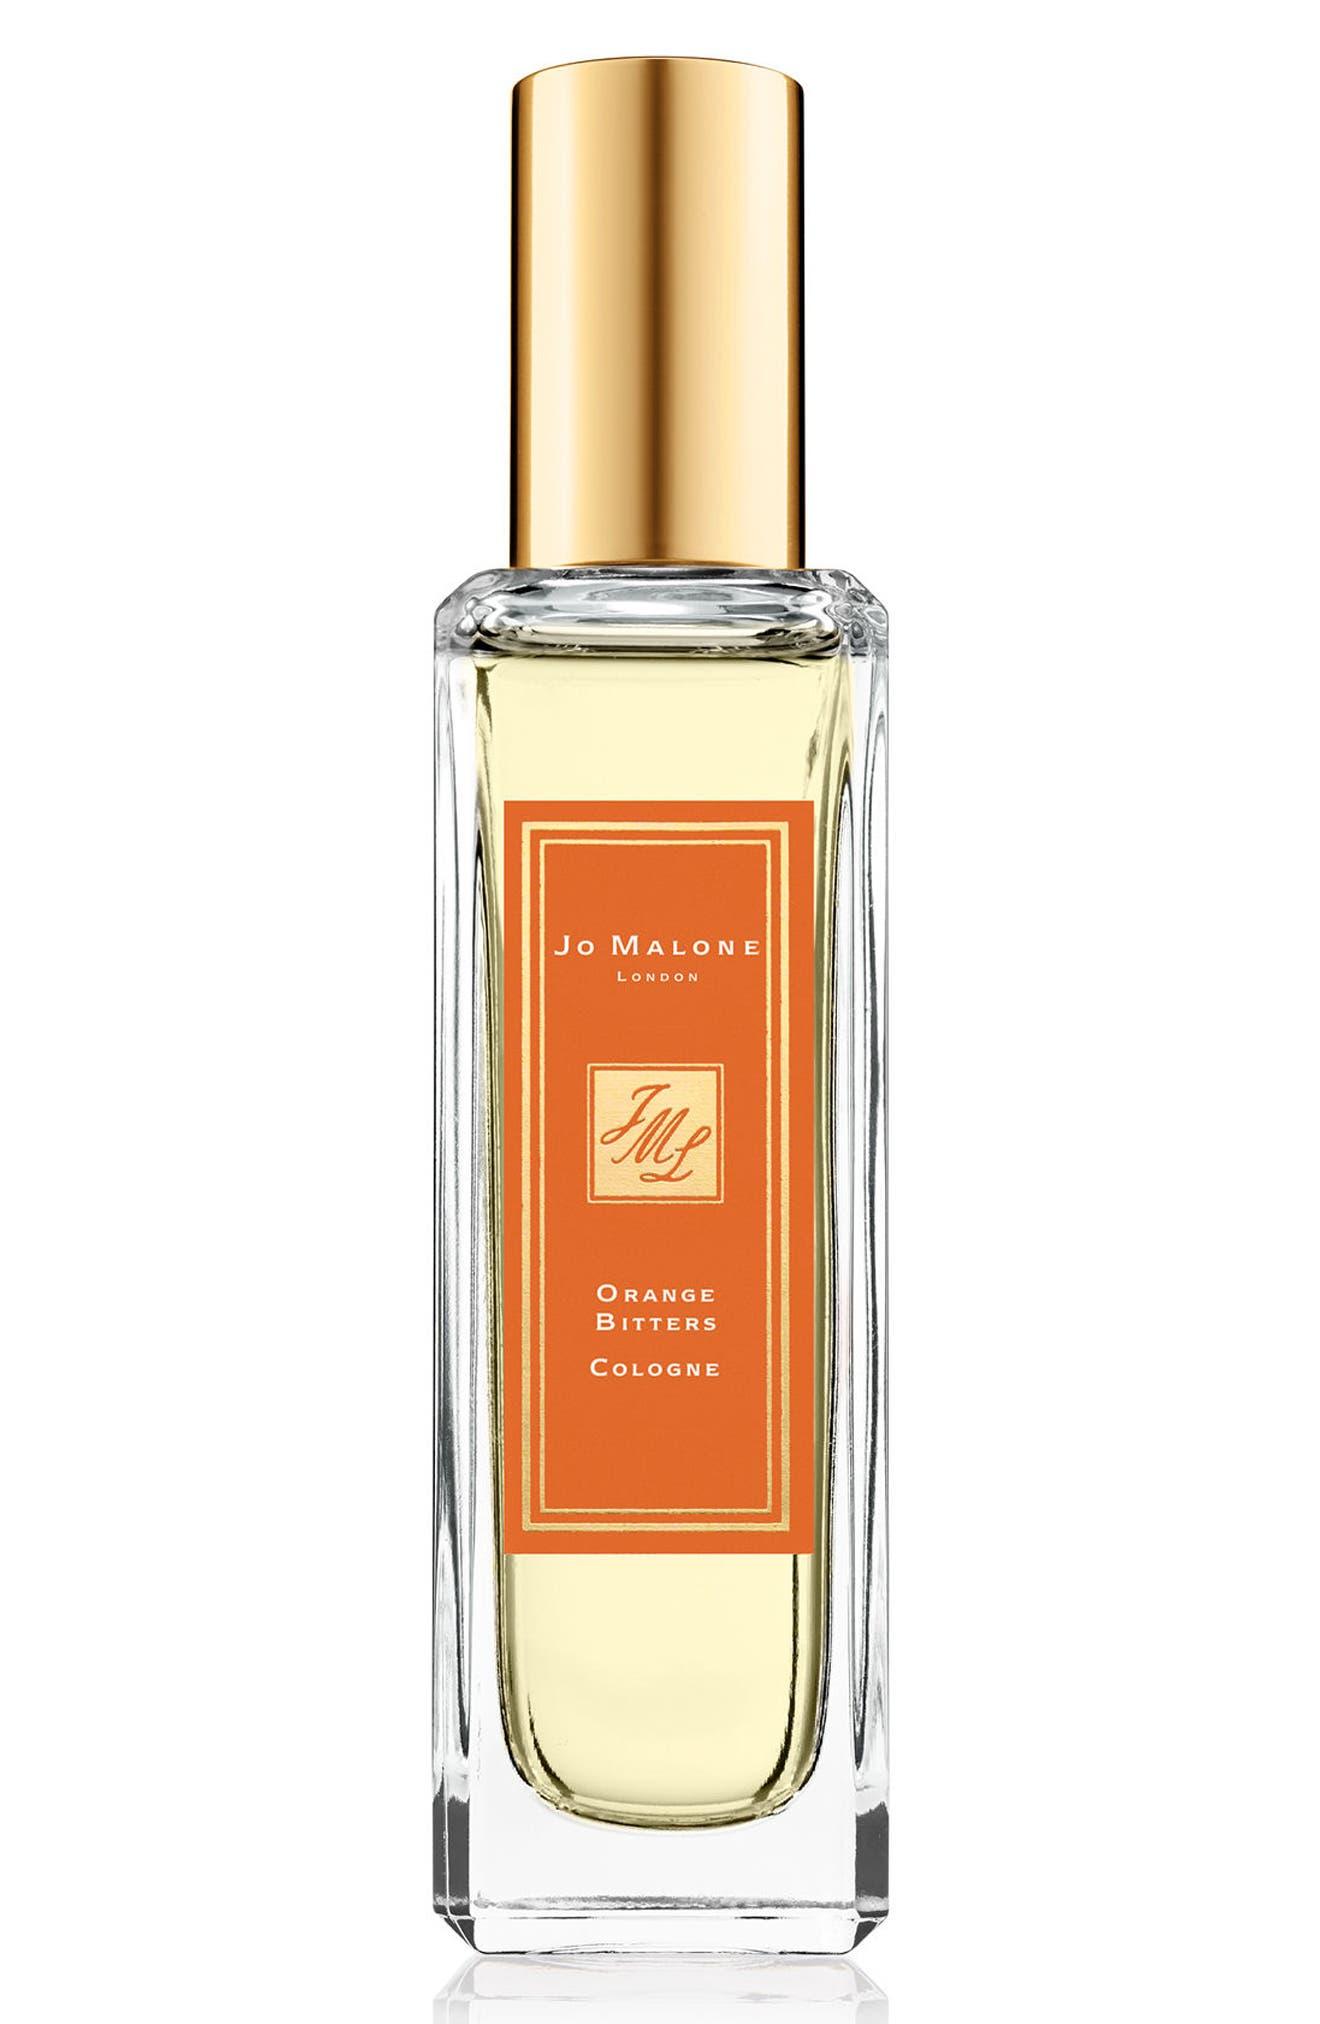 Jo Malone London™ Orange Bitters Cologne